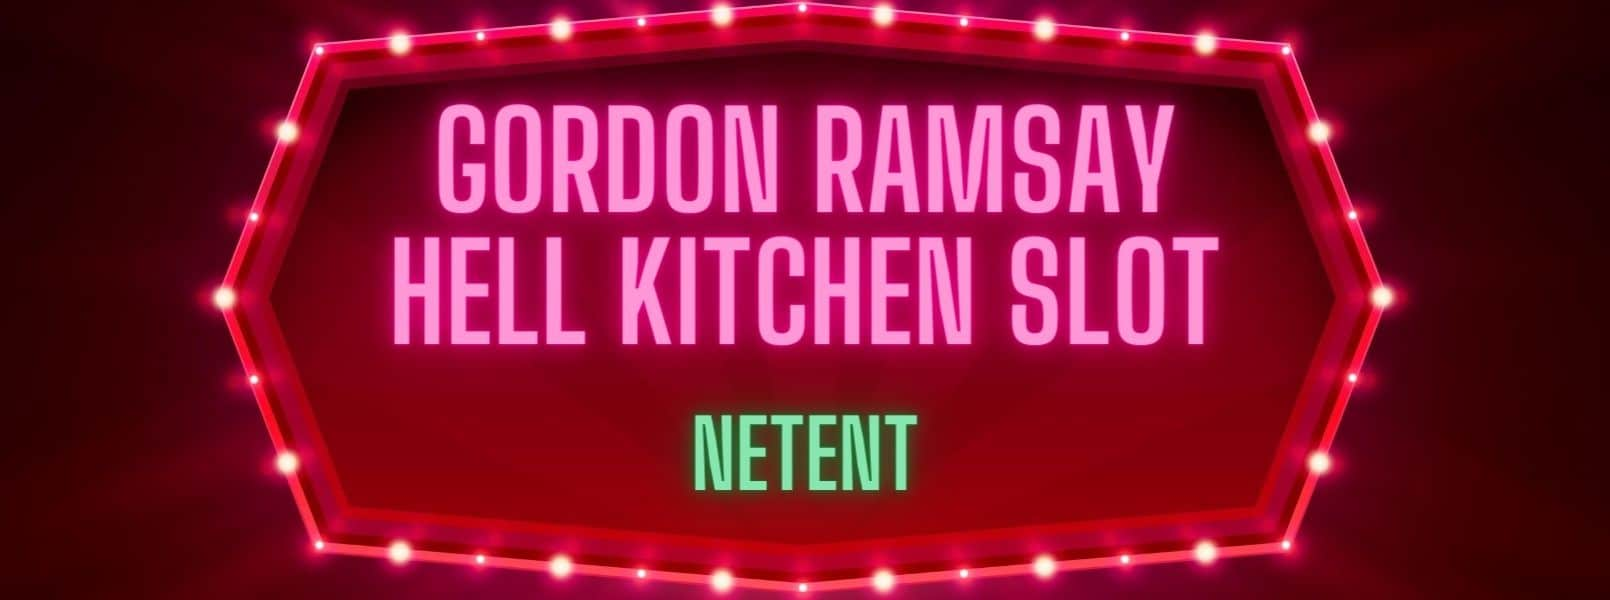 banner gordon ramsay hell kitchen slot